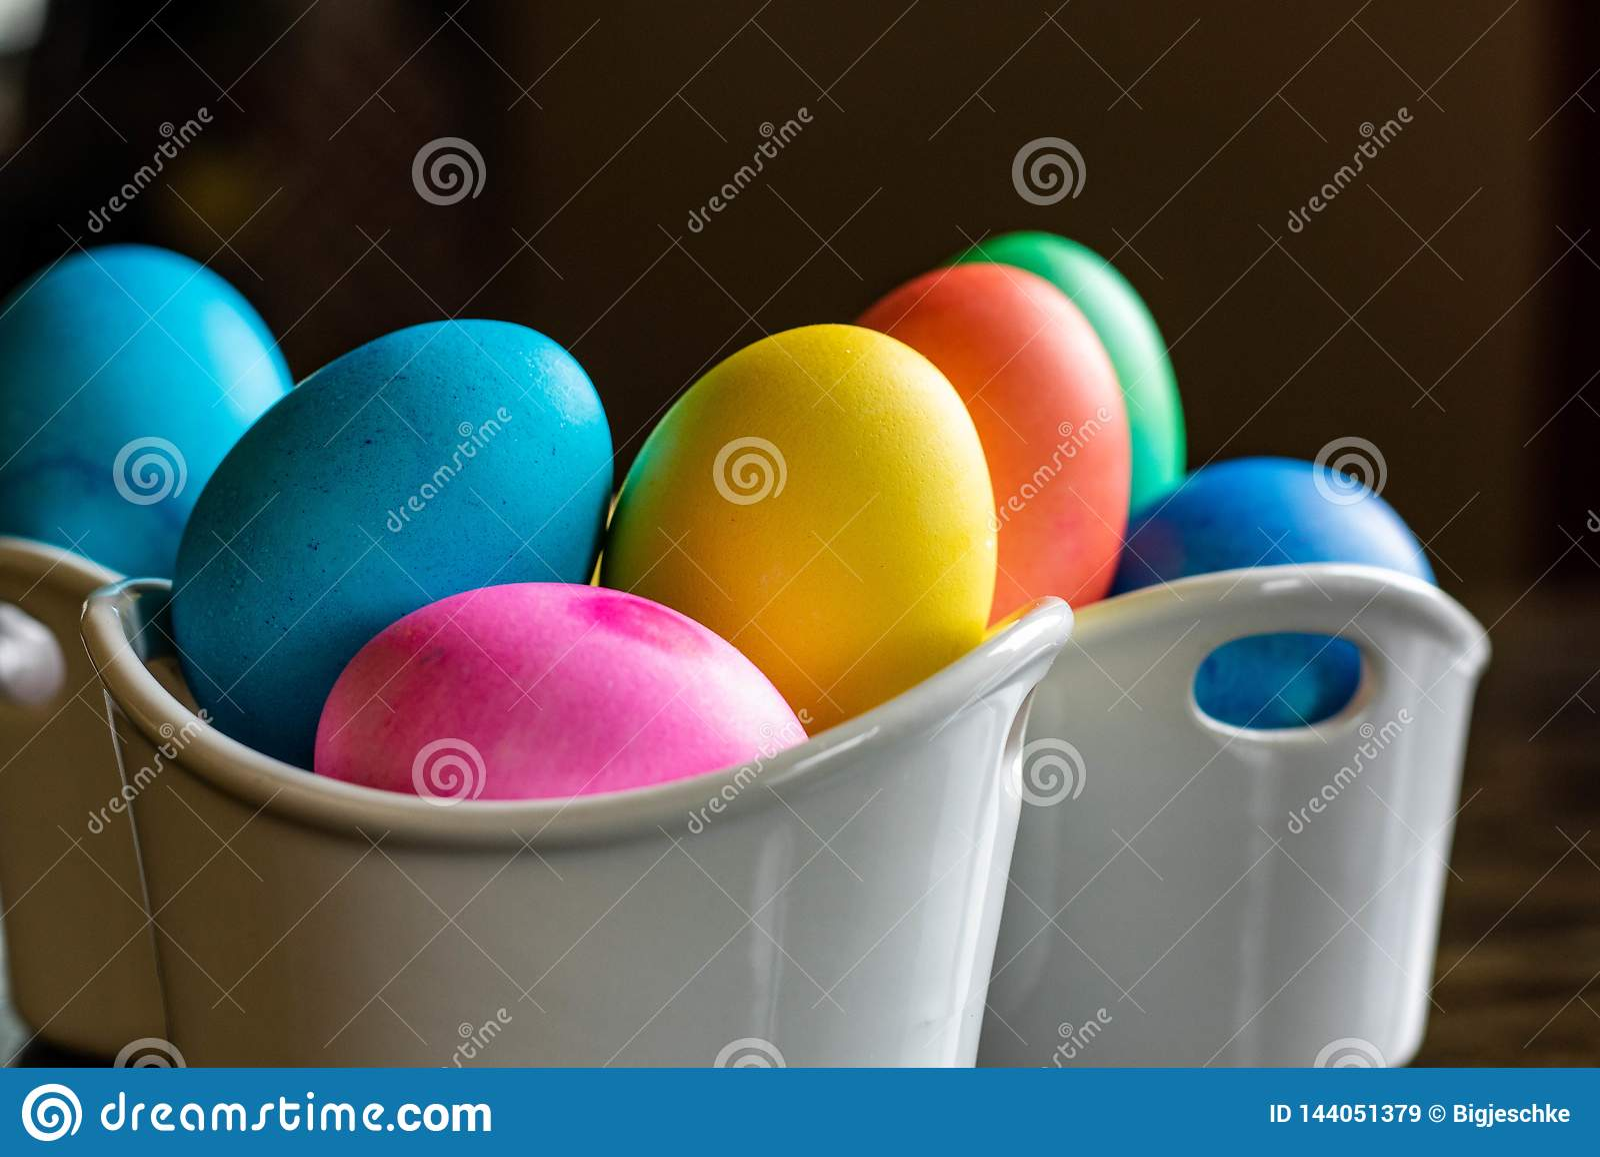 Colorful Easter egg arrangement in white bowls